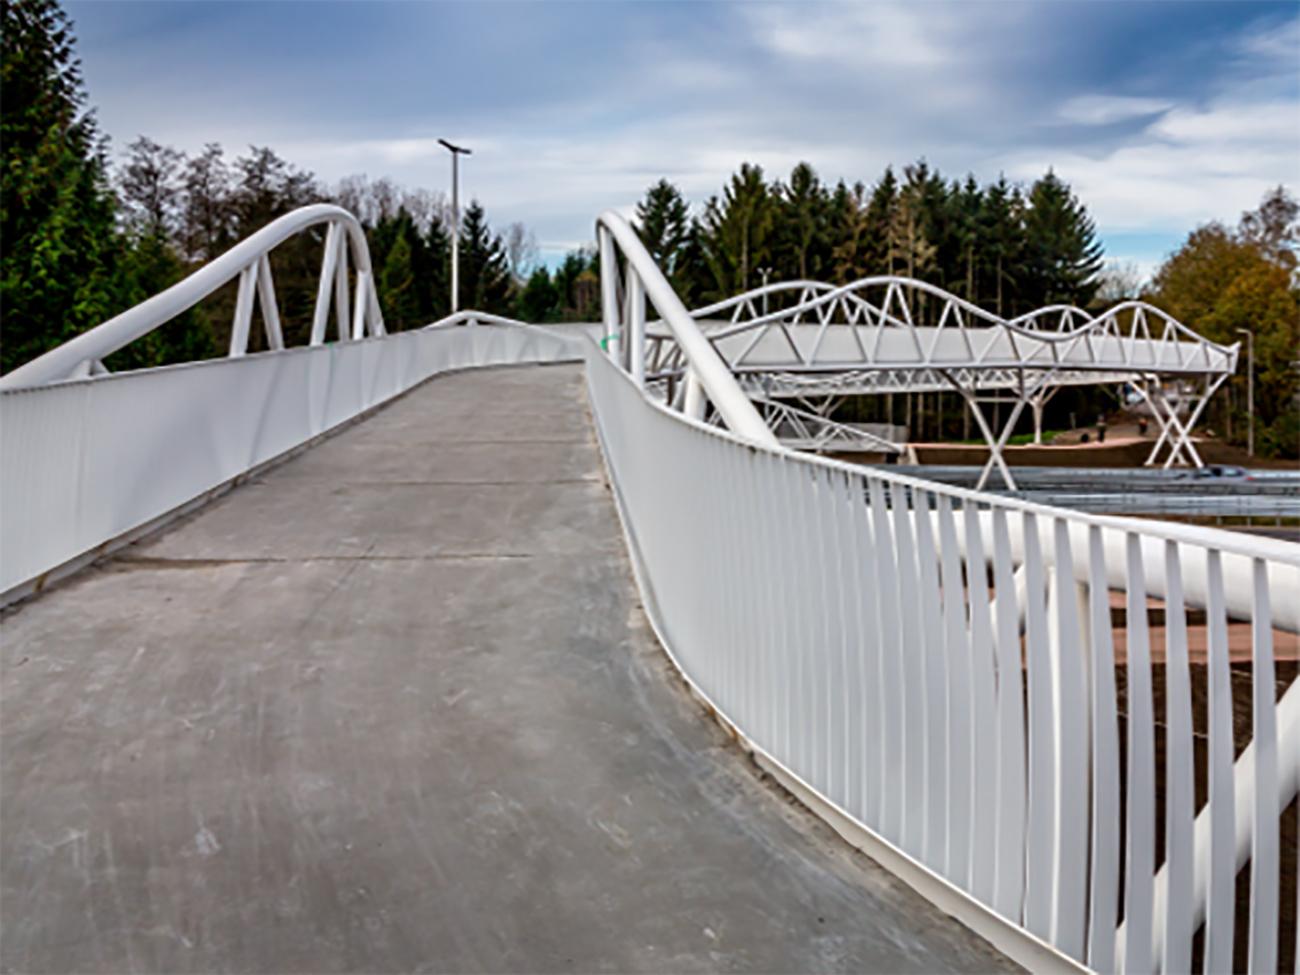 Fietsersbrug Genk02_1300x975